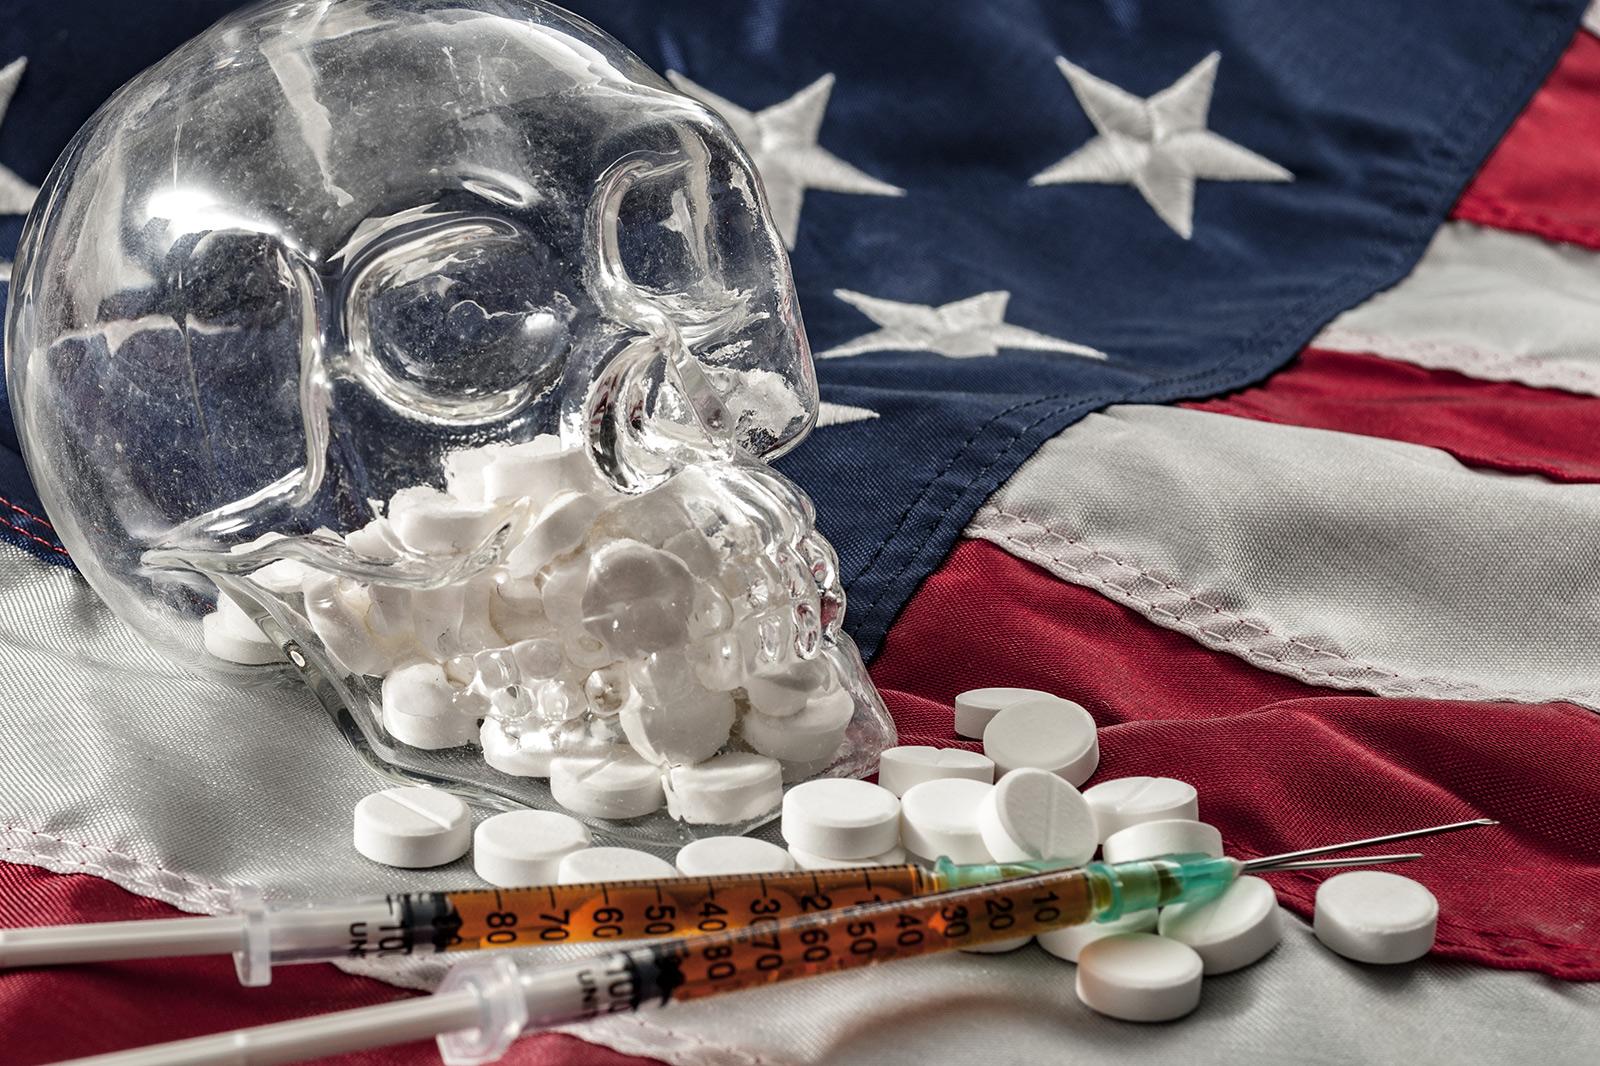 Ibiza Calm - America's Oxycontin Epidemic